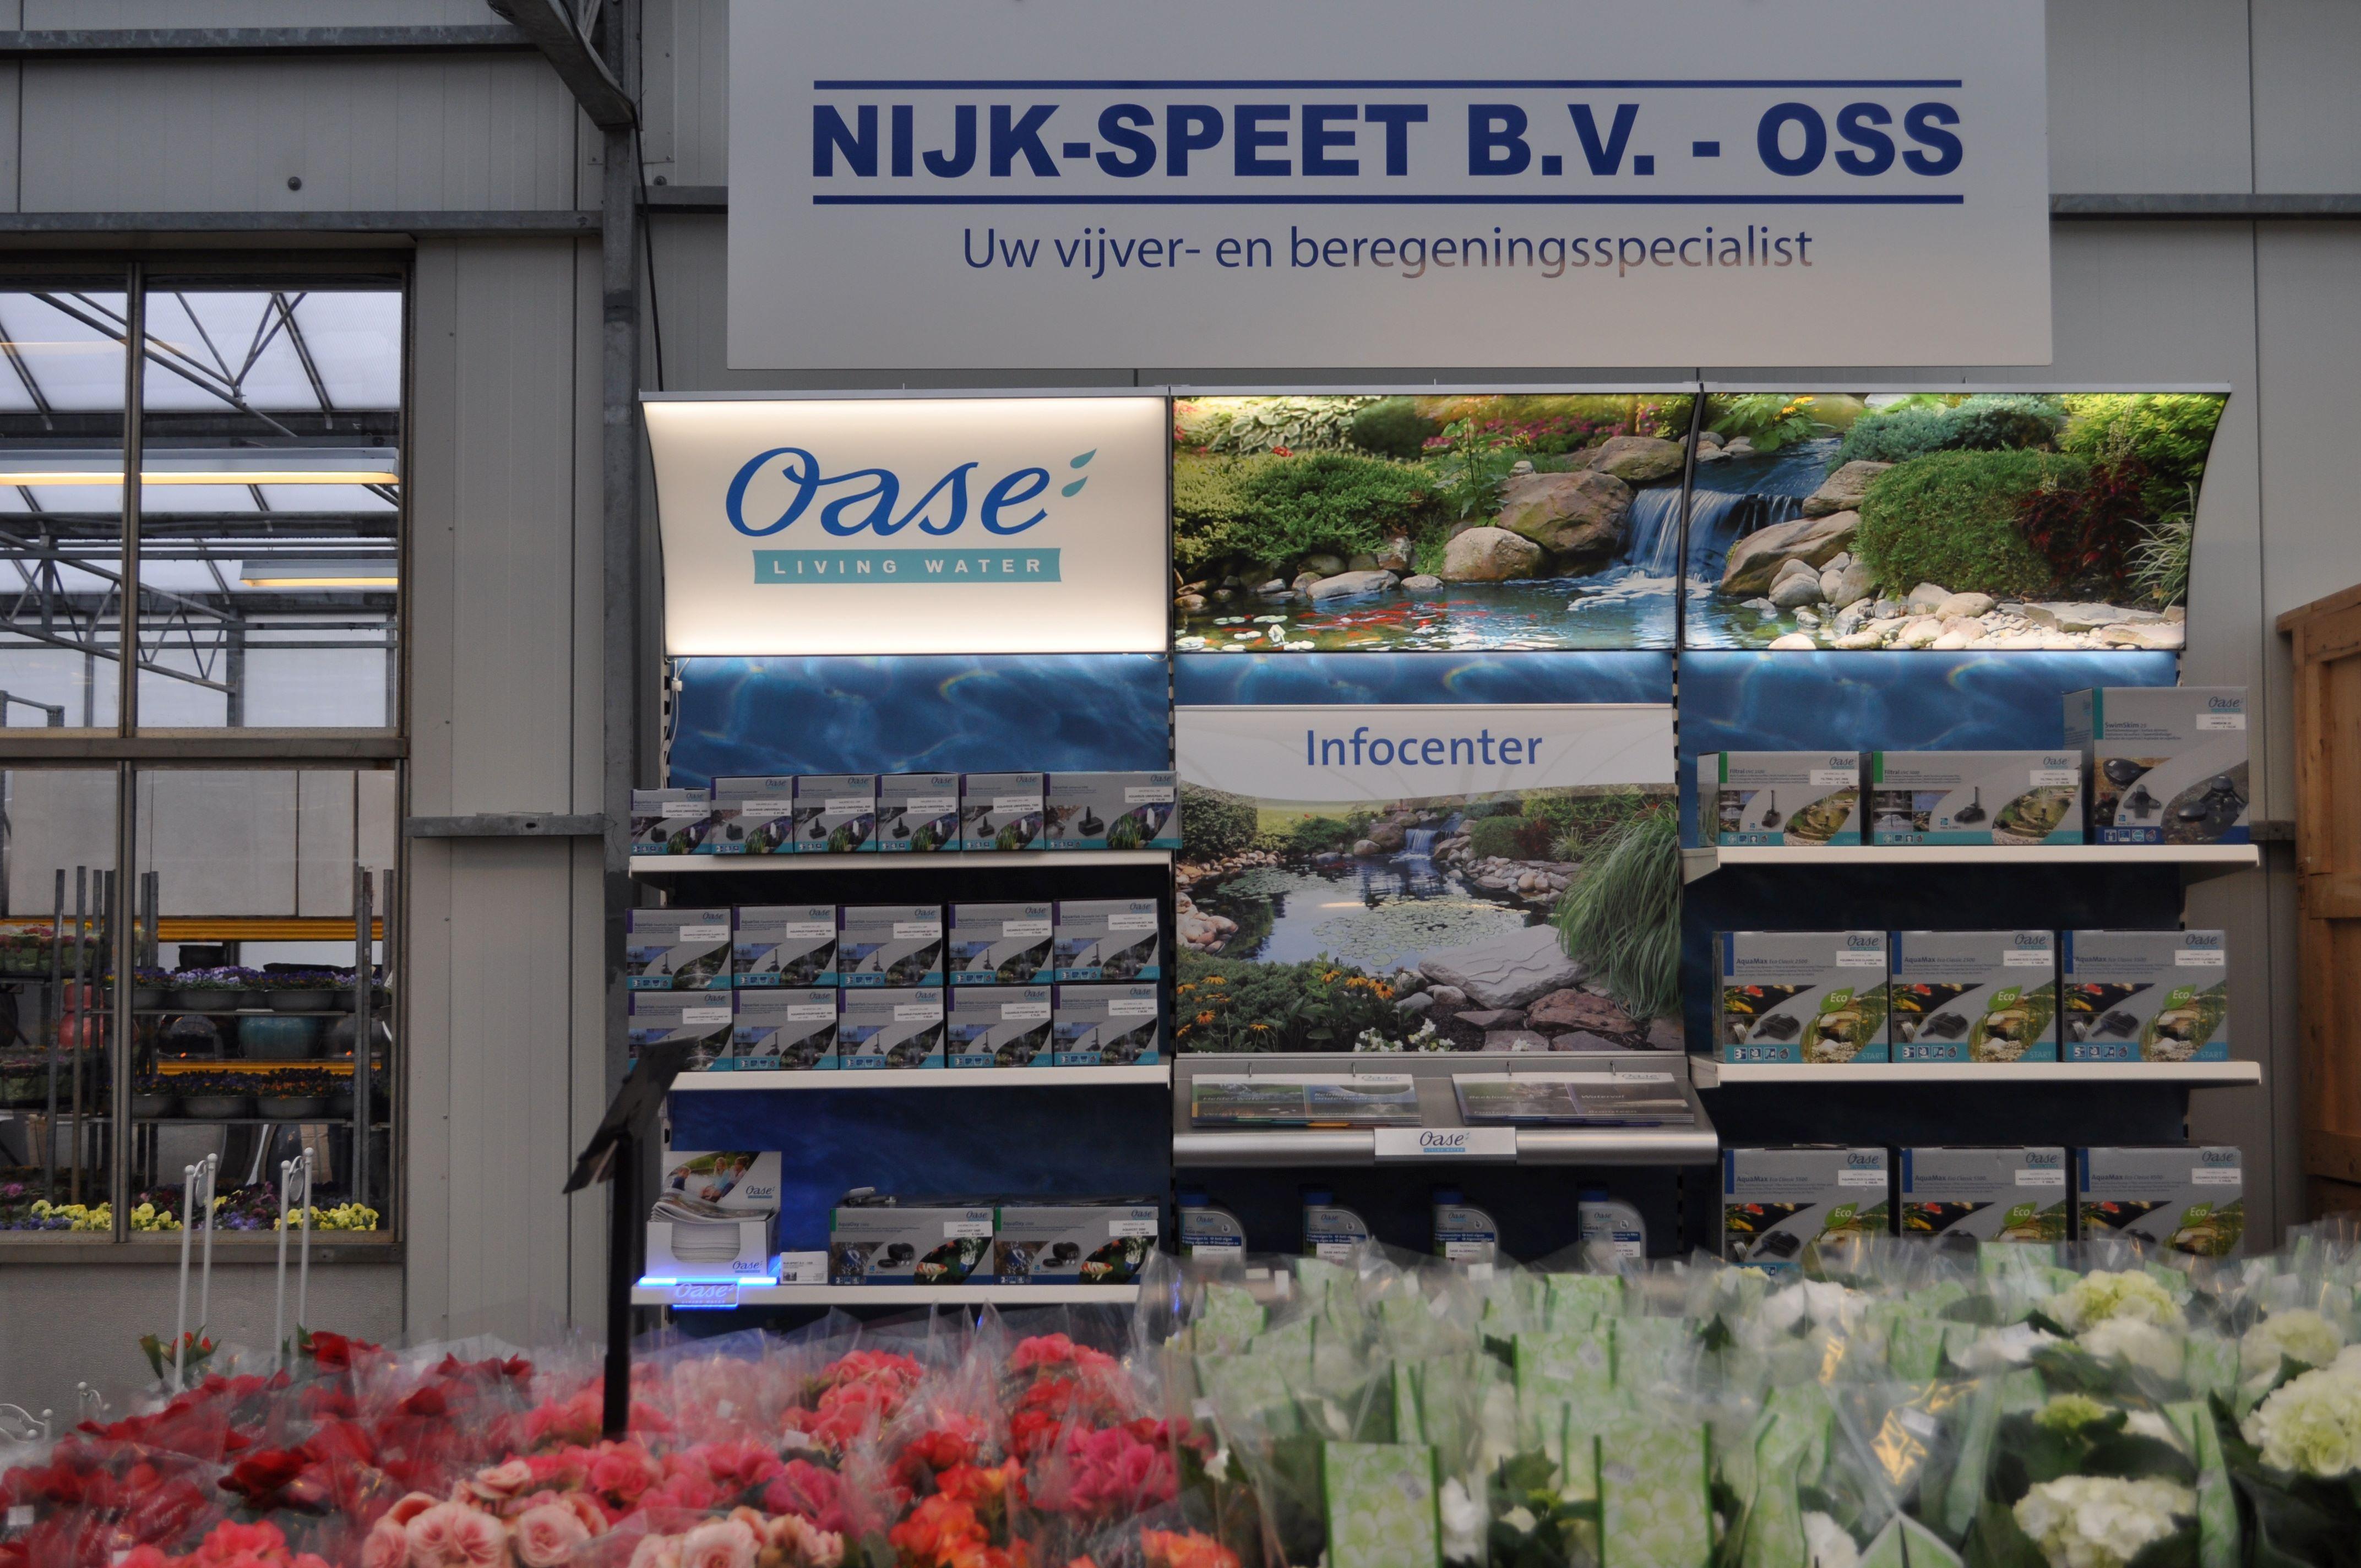 Nijk-Speet B.V. Oss, store in store DFM